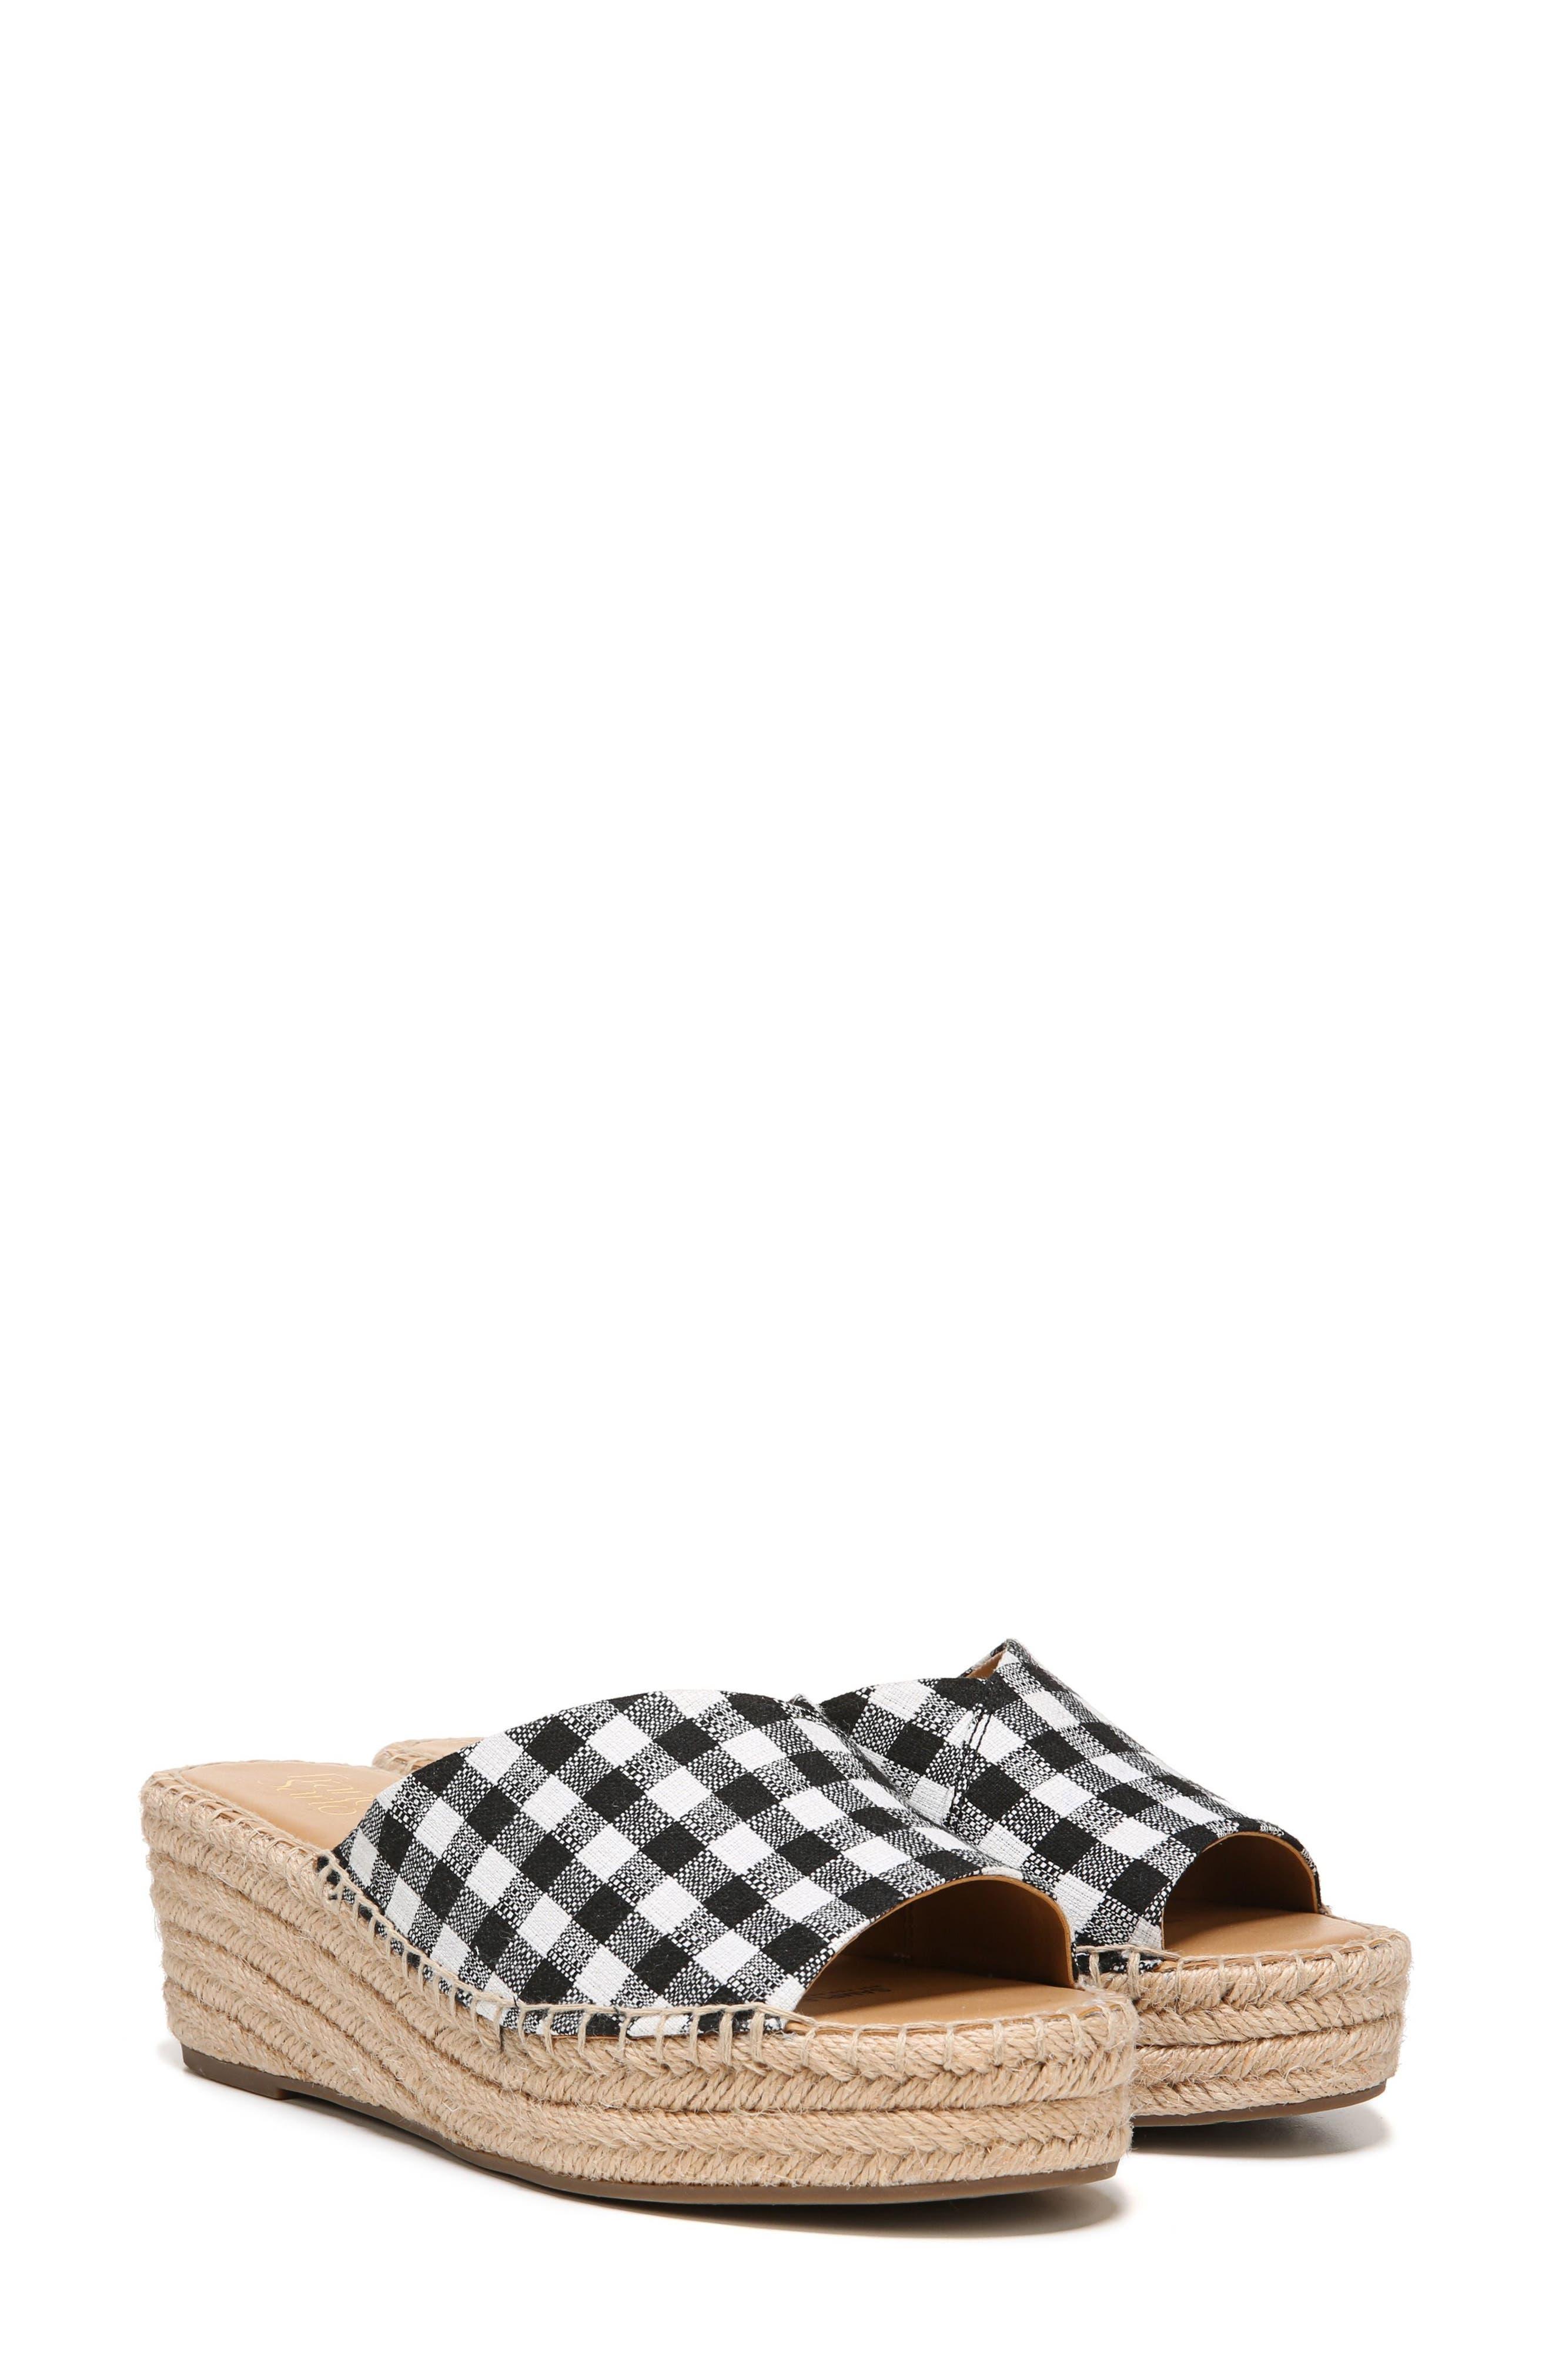 SARTO by Franco Sarto Pinot Platform Wedge Slide Sandal,                             Main thumbnail 1, color,                             BLACK/ WHITE